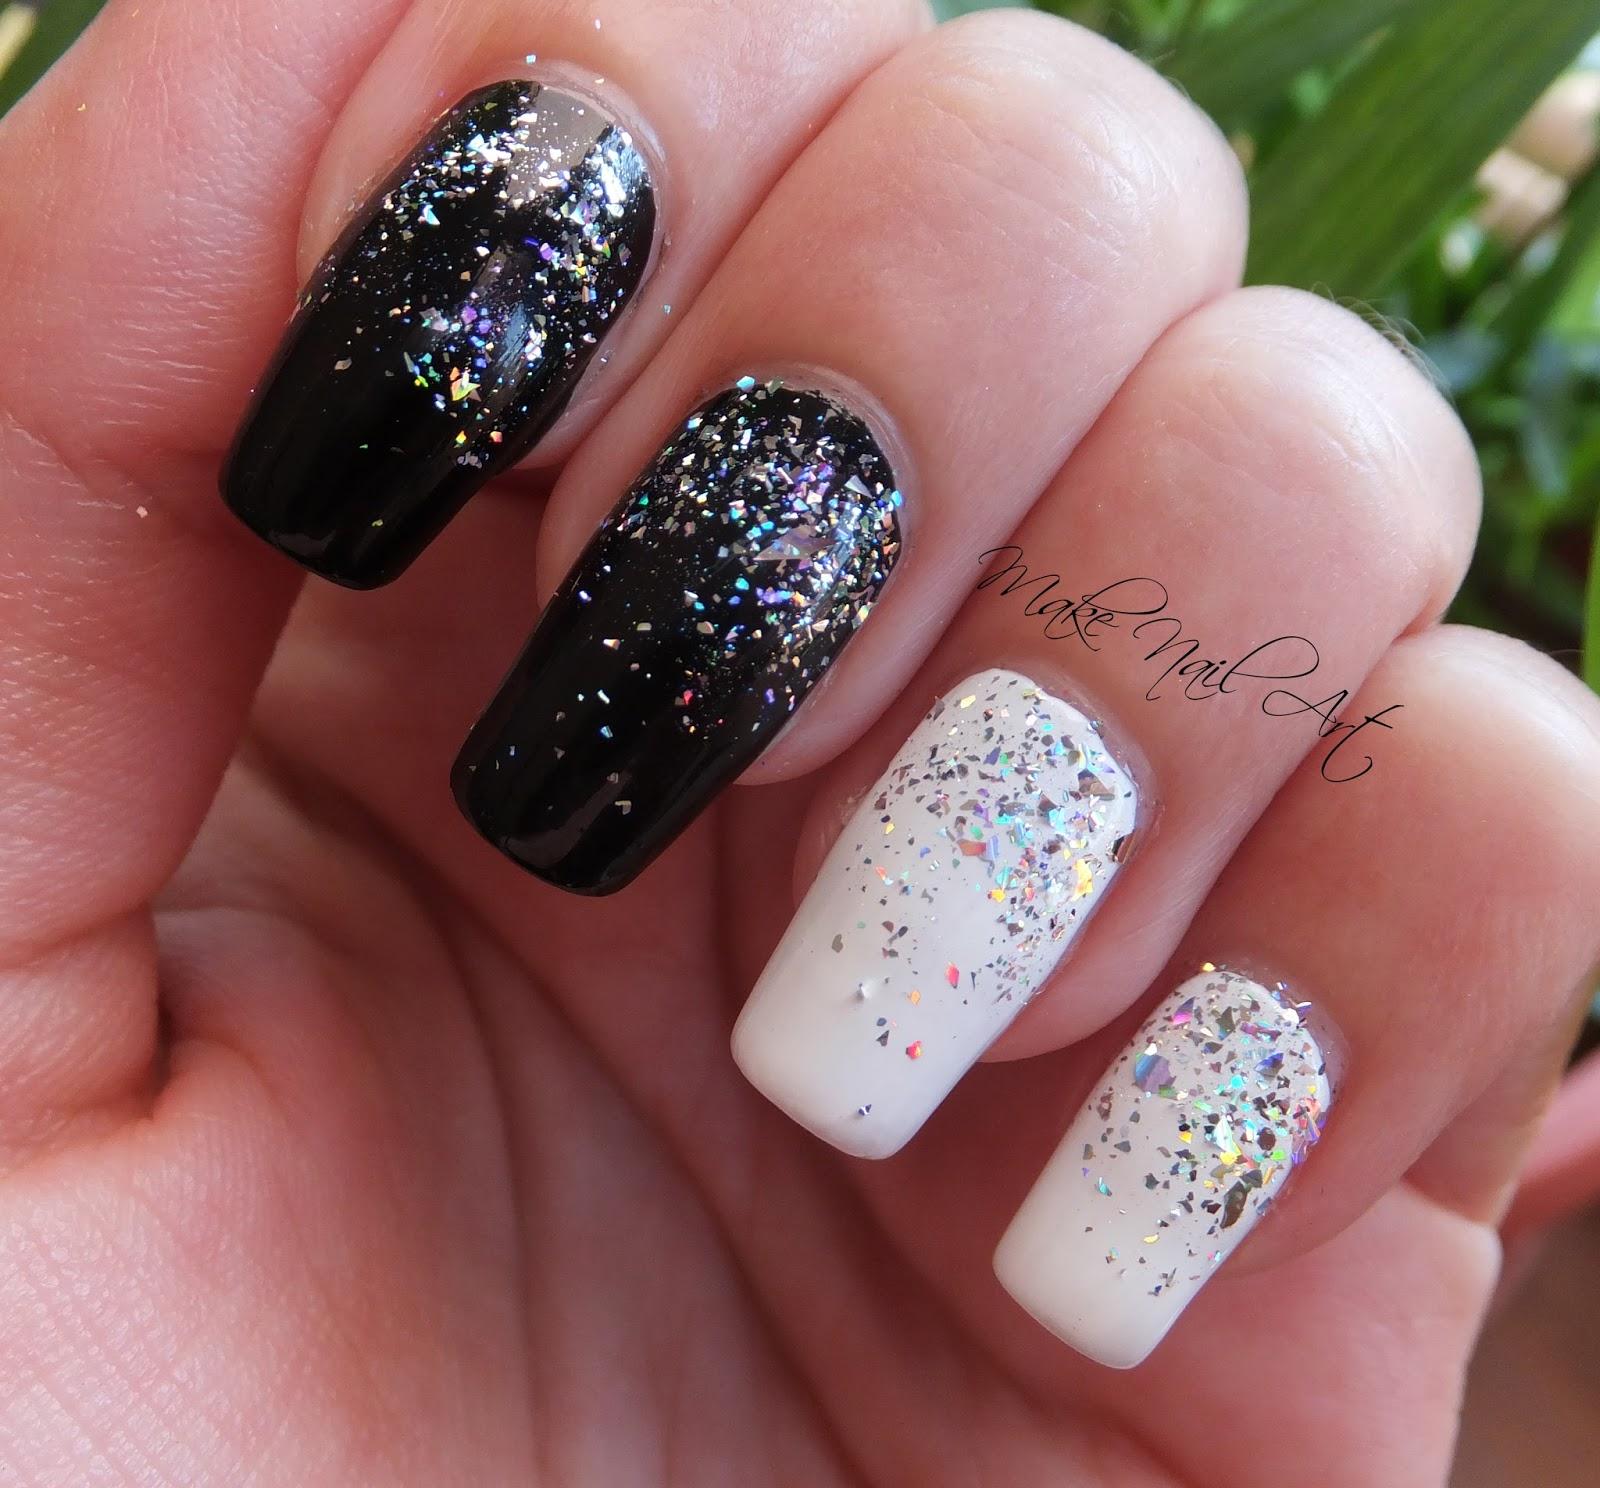 Glitch Holographic Waterfall Nail Art: Make Nail Art: Black And White Holographic Glitter